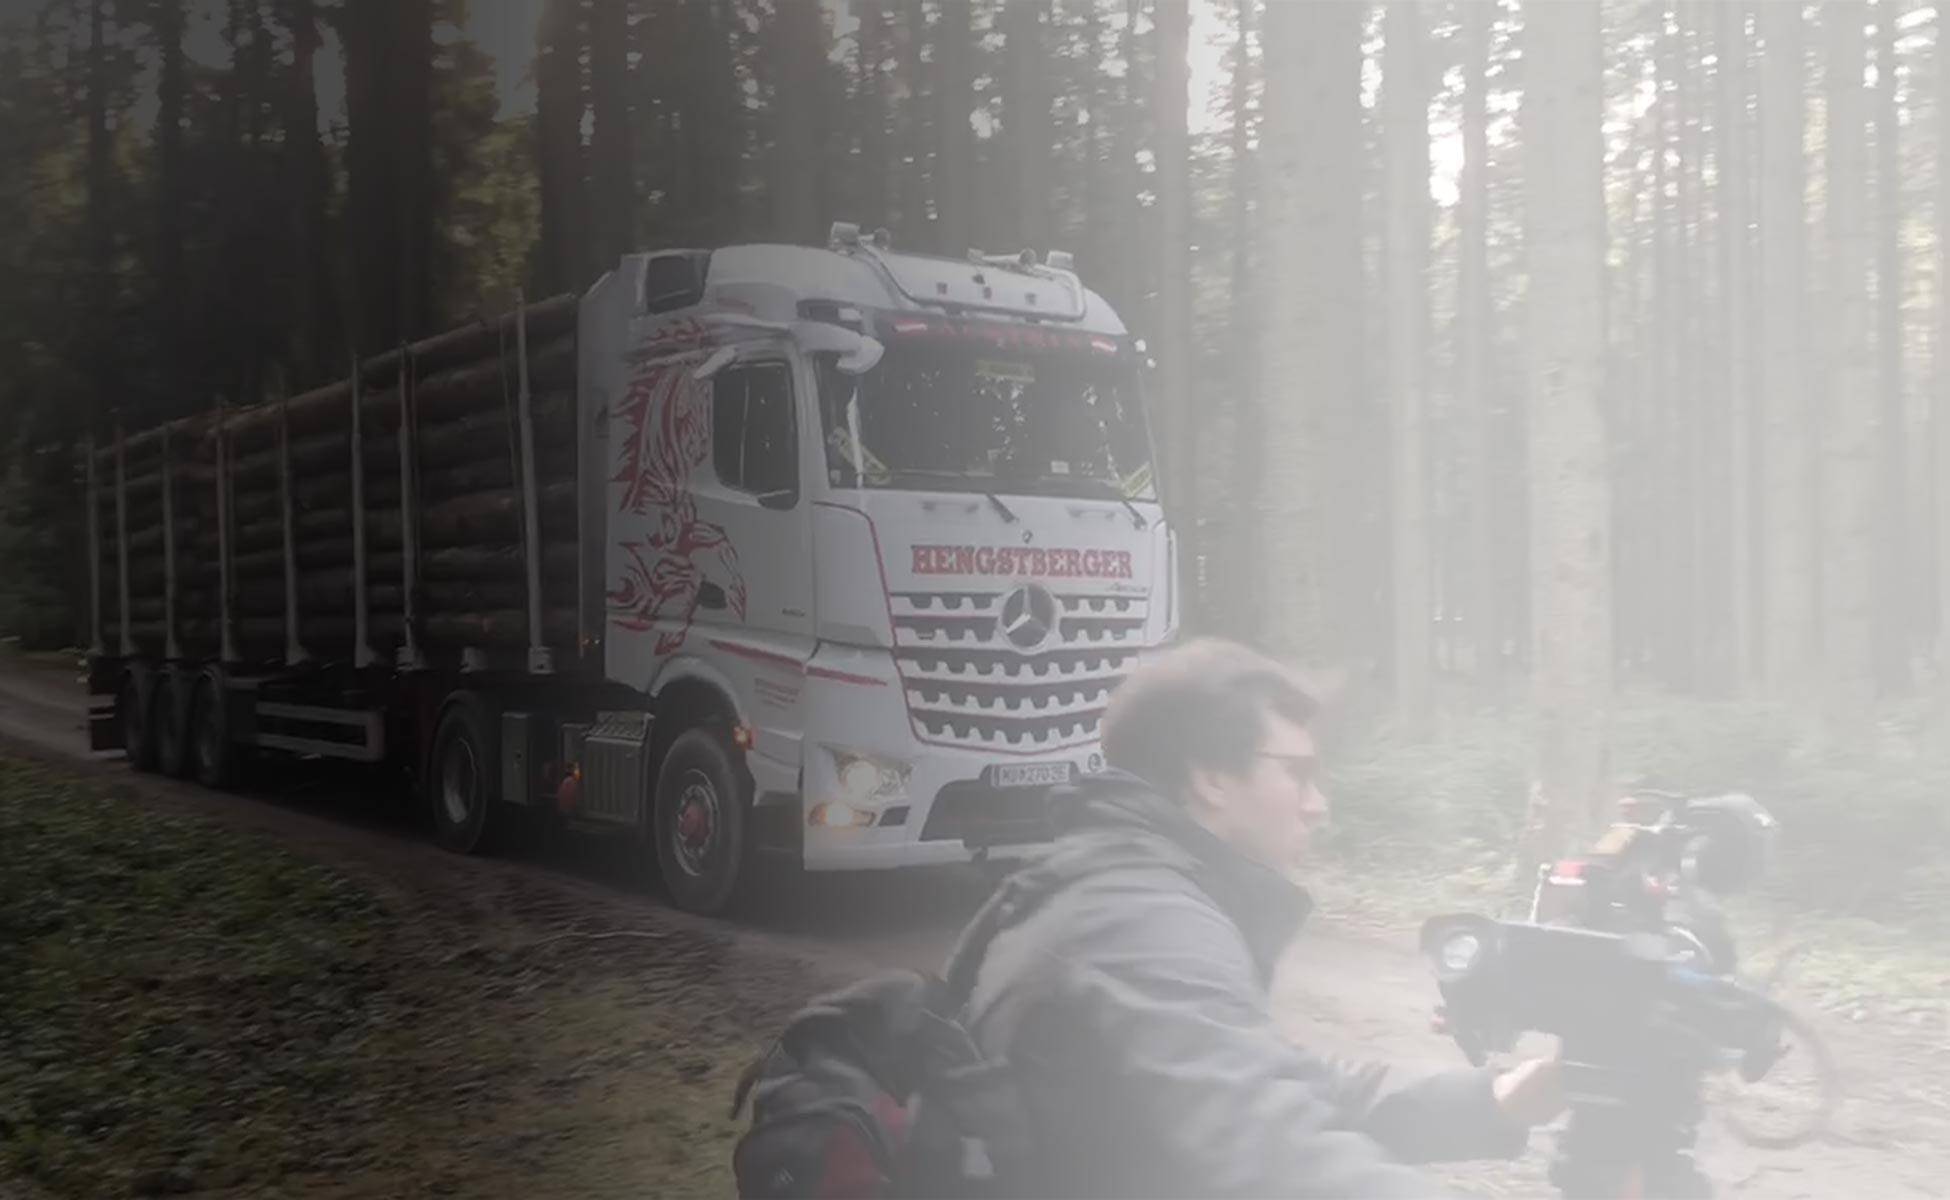 Hengstberger ORF Filmdreh Wald für Sendung Autofokus